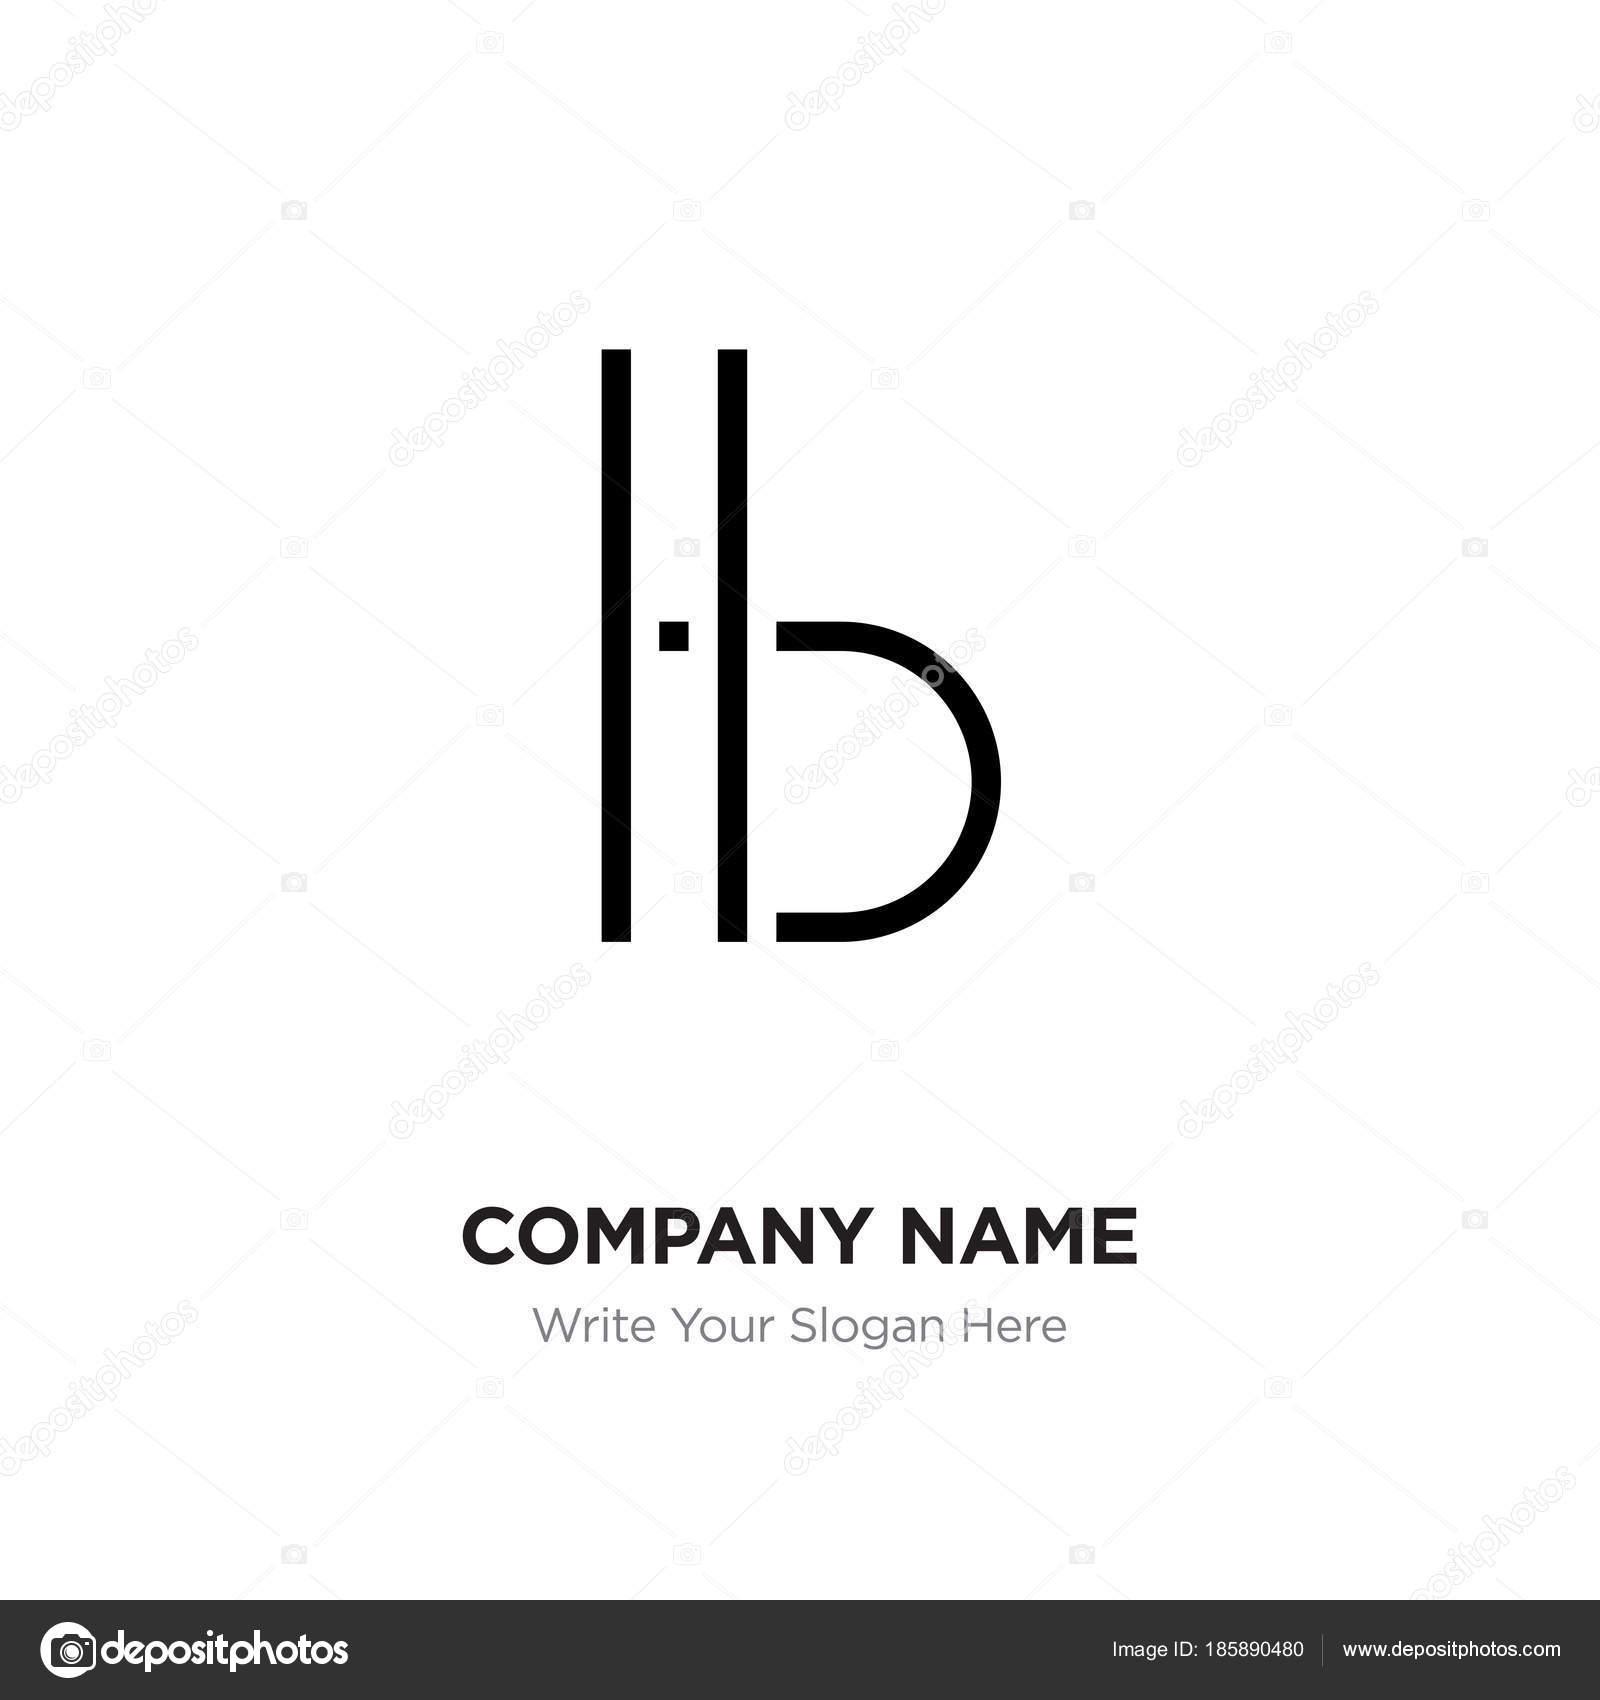 Bh Design abstract letter bh hb logo design template black alphabet initi